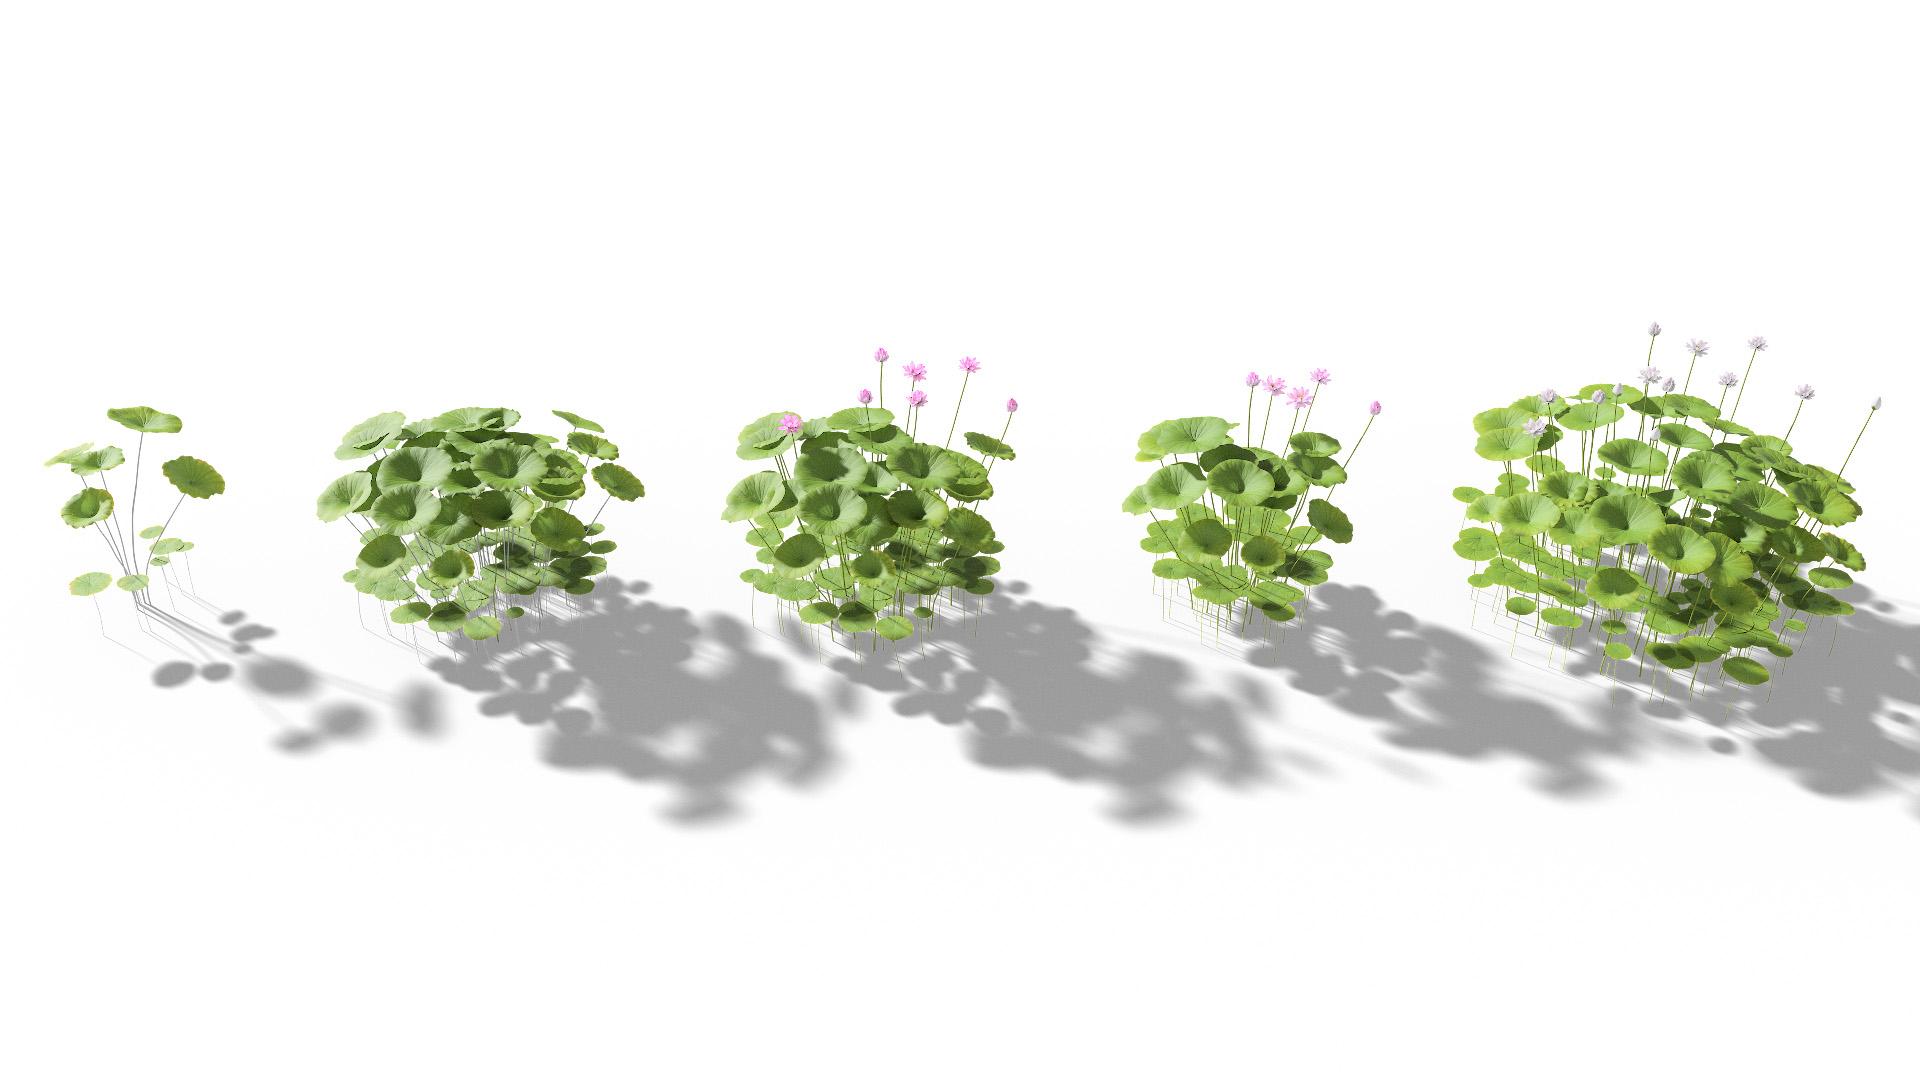 3D model of the Sacred lotus Nelumbo nucifera different presets